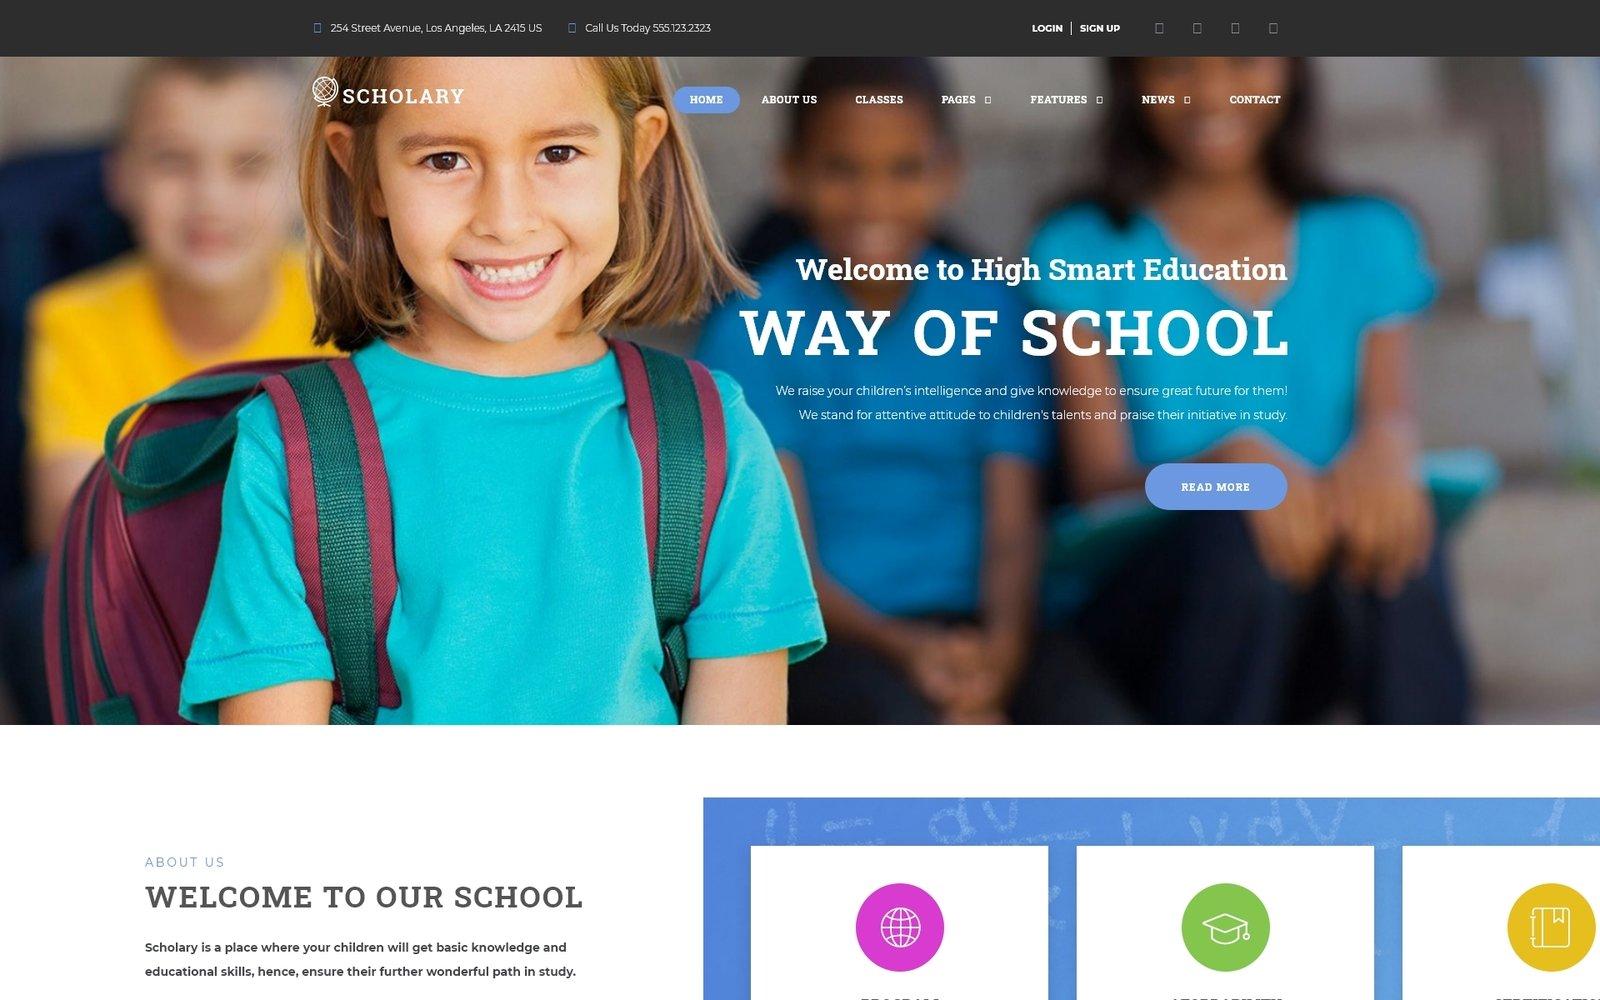 Scholary - Primary School WordPress Theme - screenshot